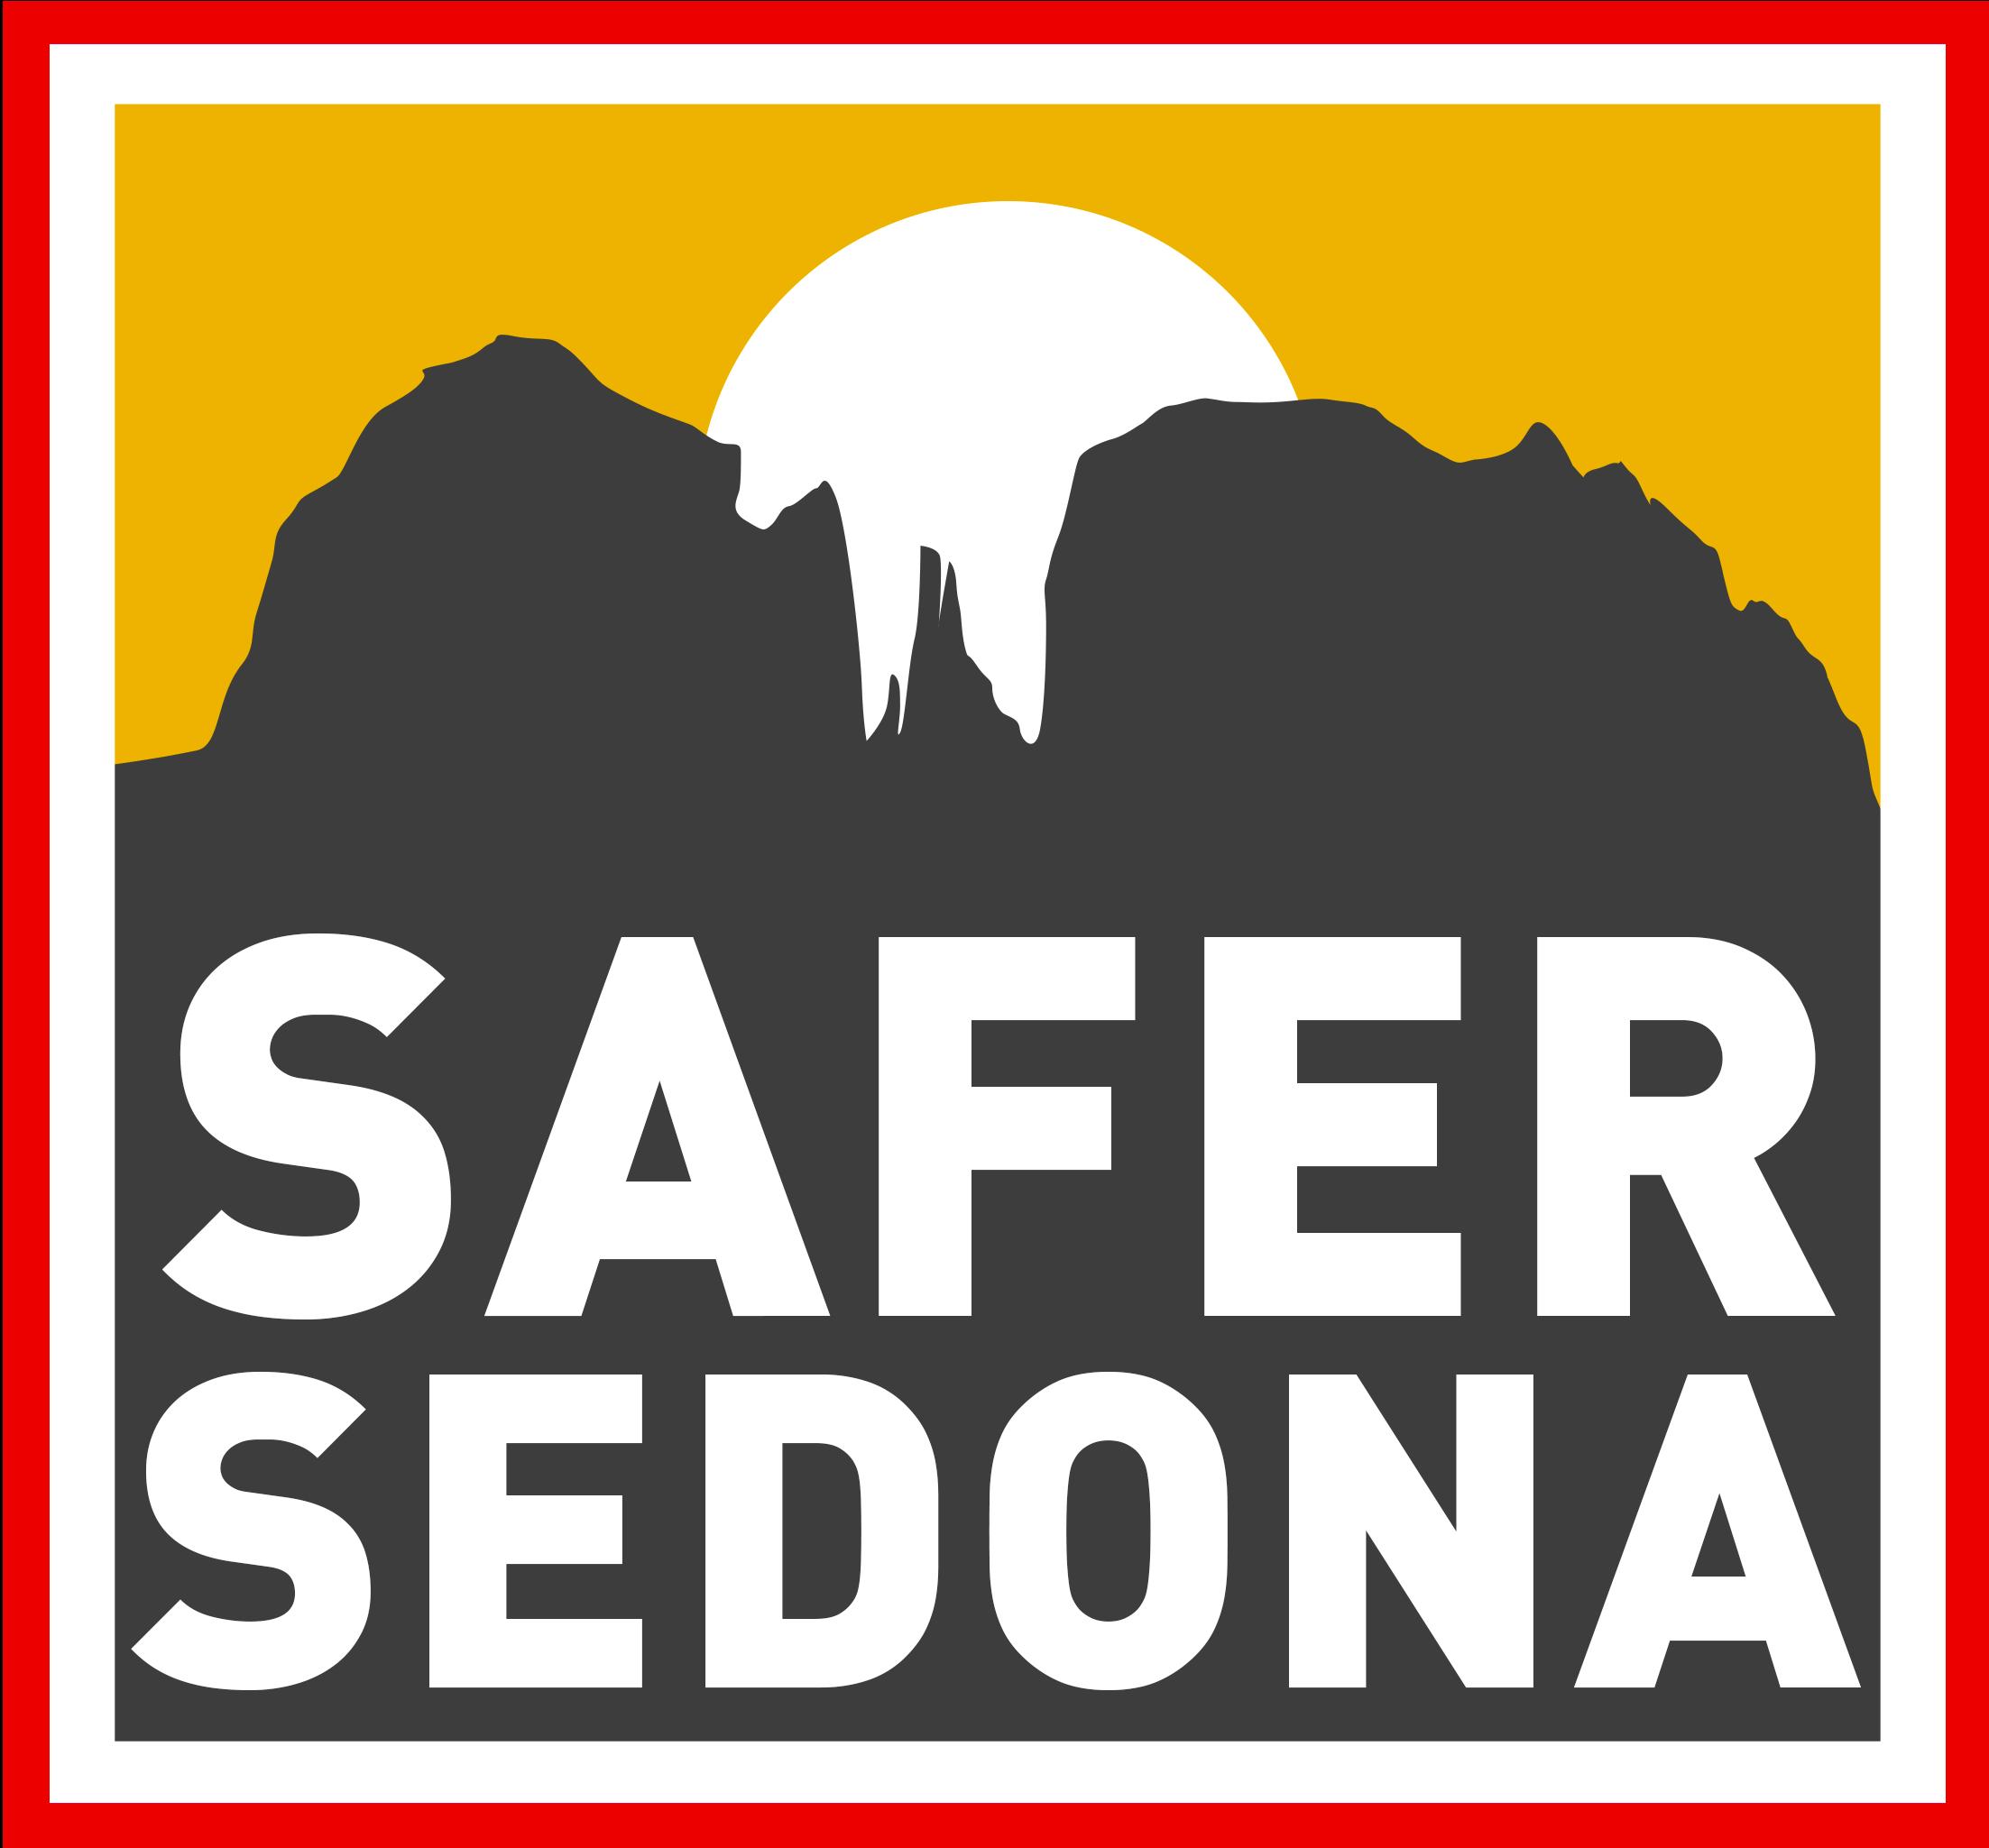 SAFER SEDONA